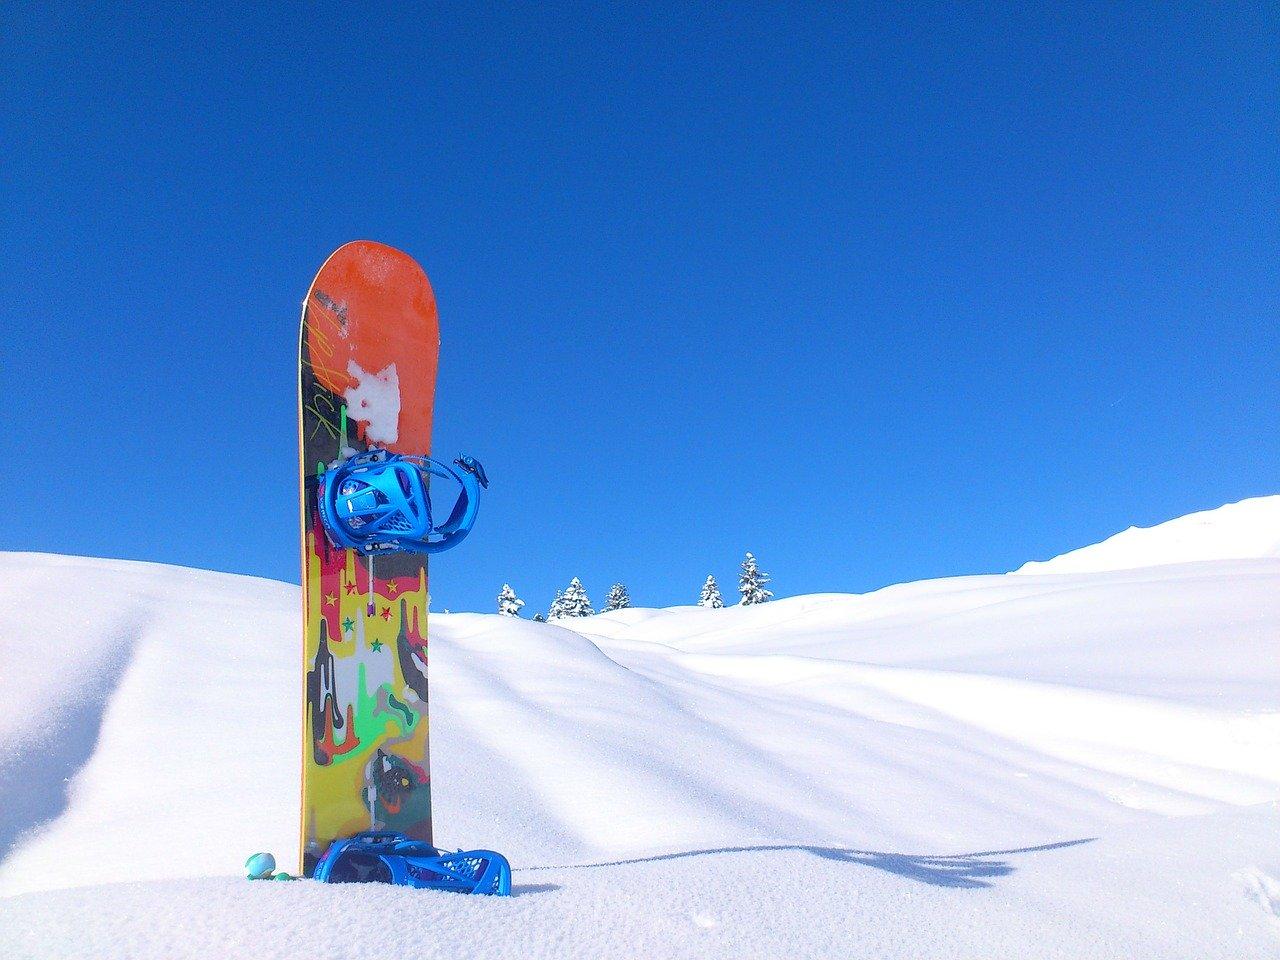 conseil sac snowboard